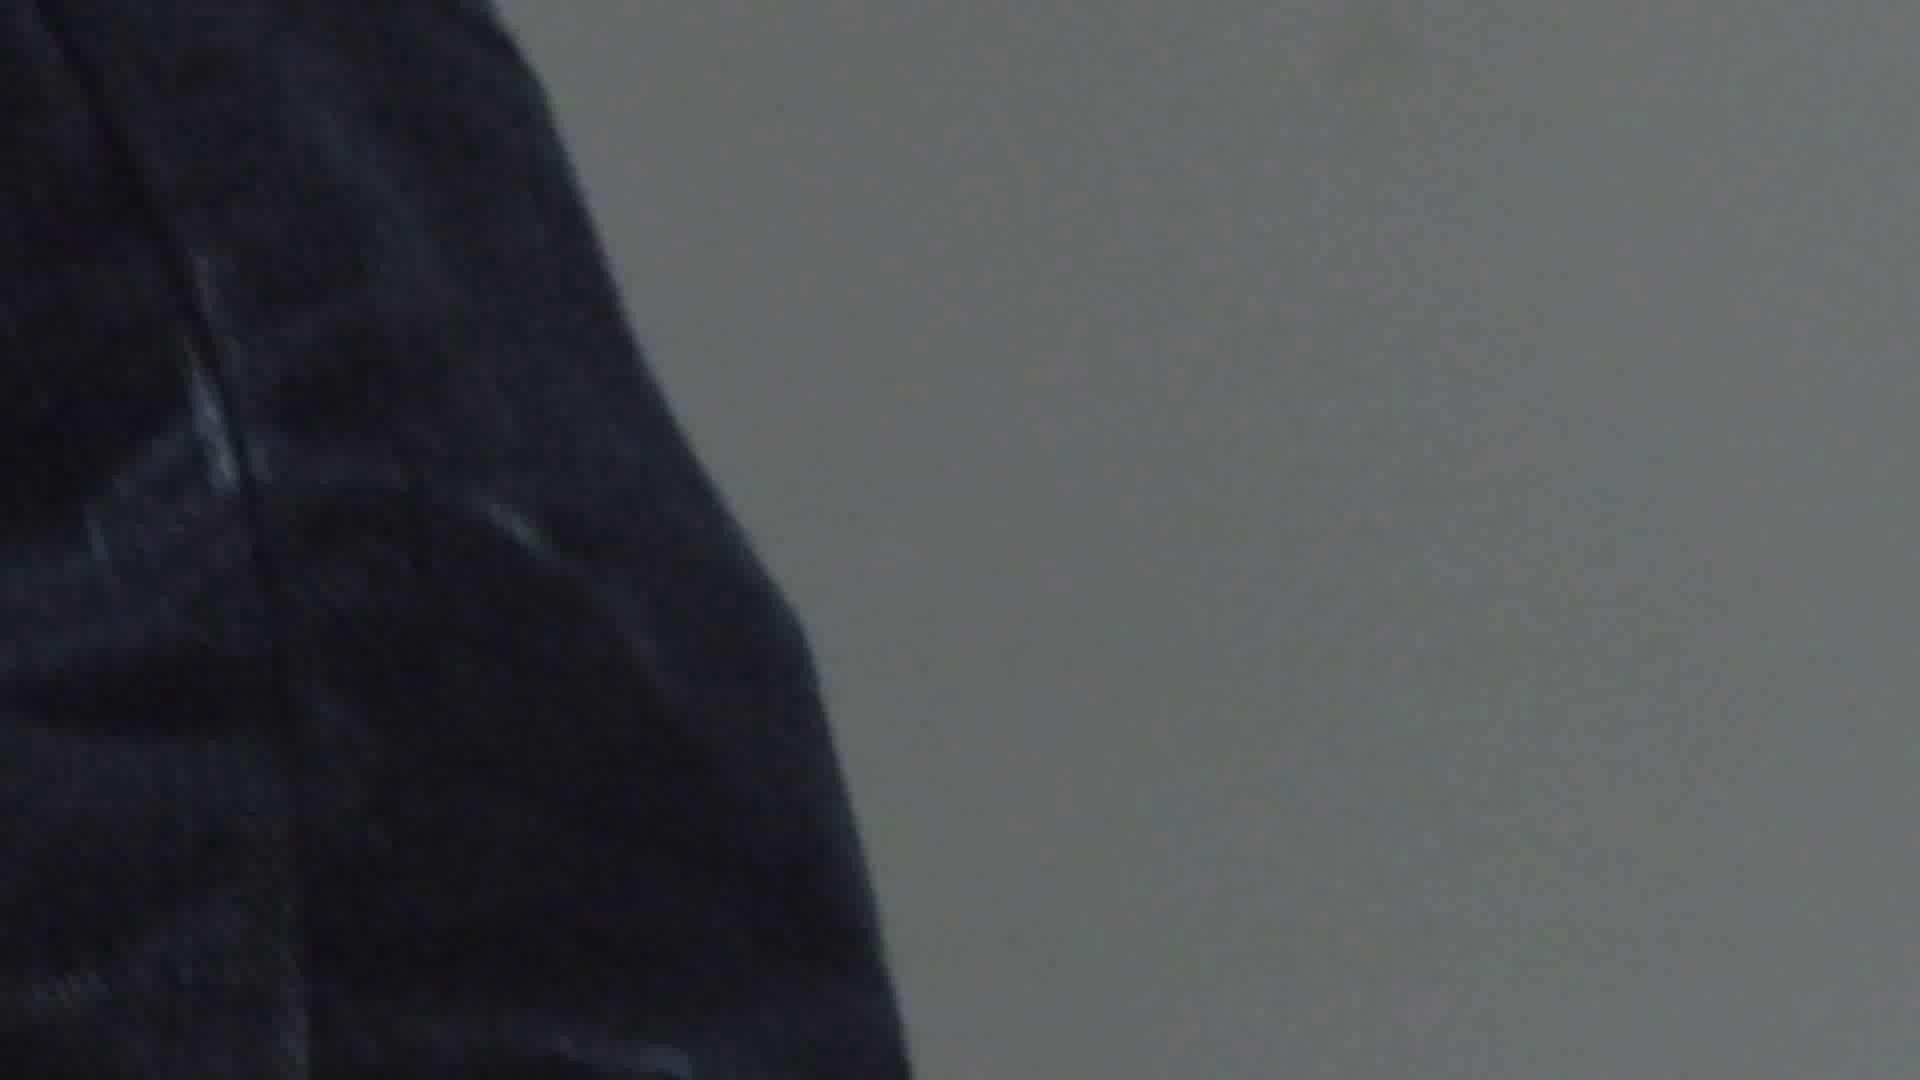 vol.25三十時間潜り、一つしか出会えない完璧桃尻編 byお銀 美人  96連発 24